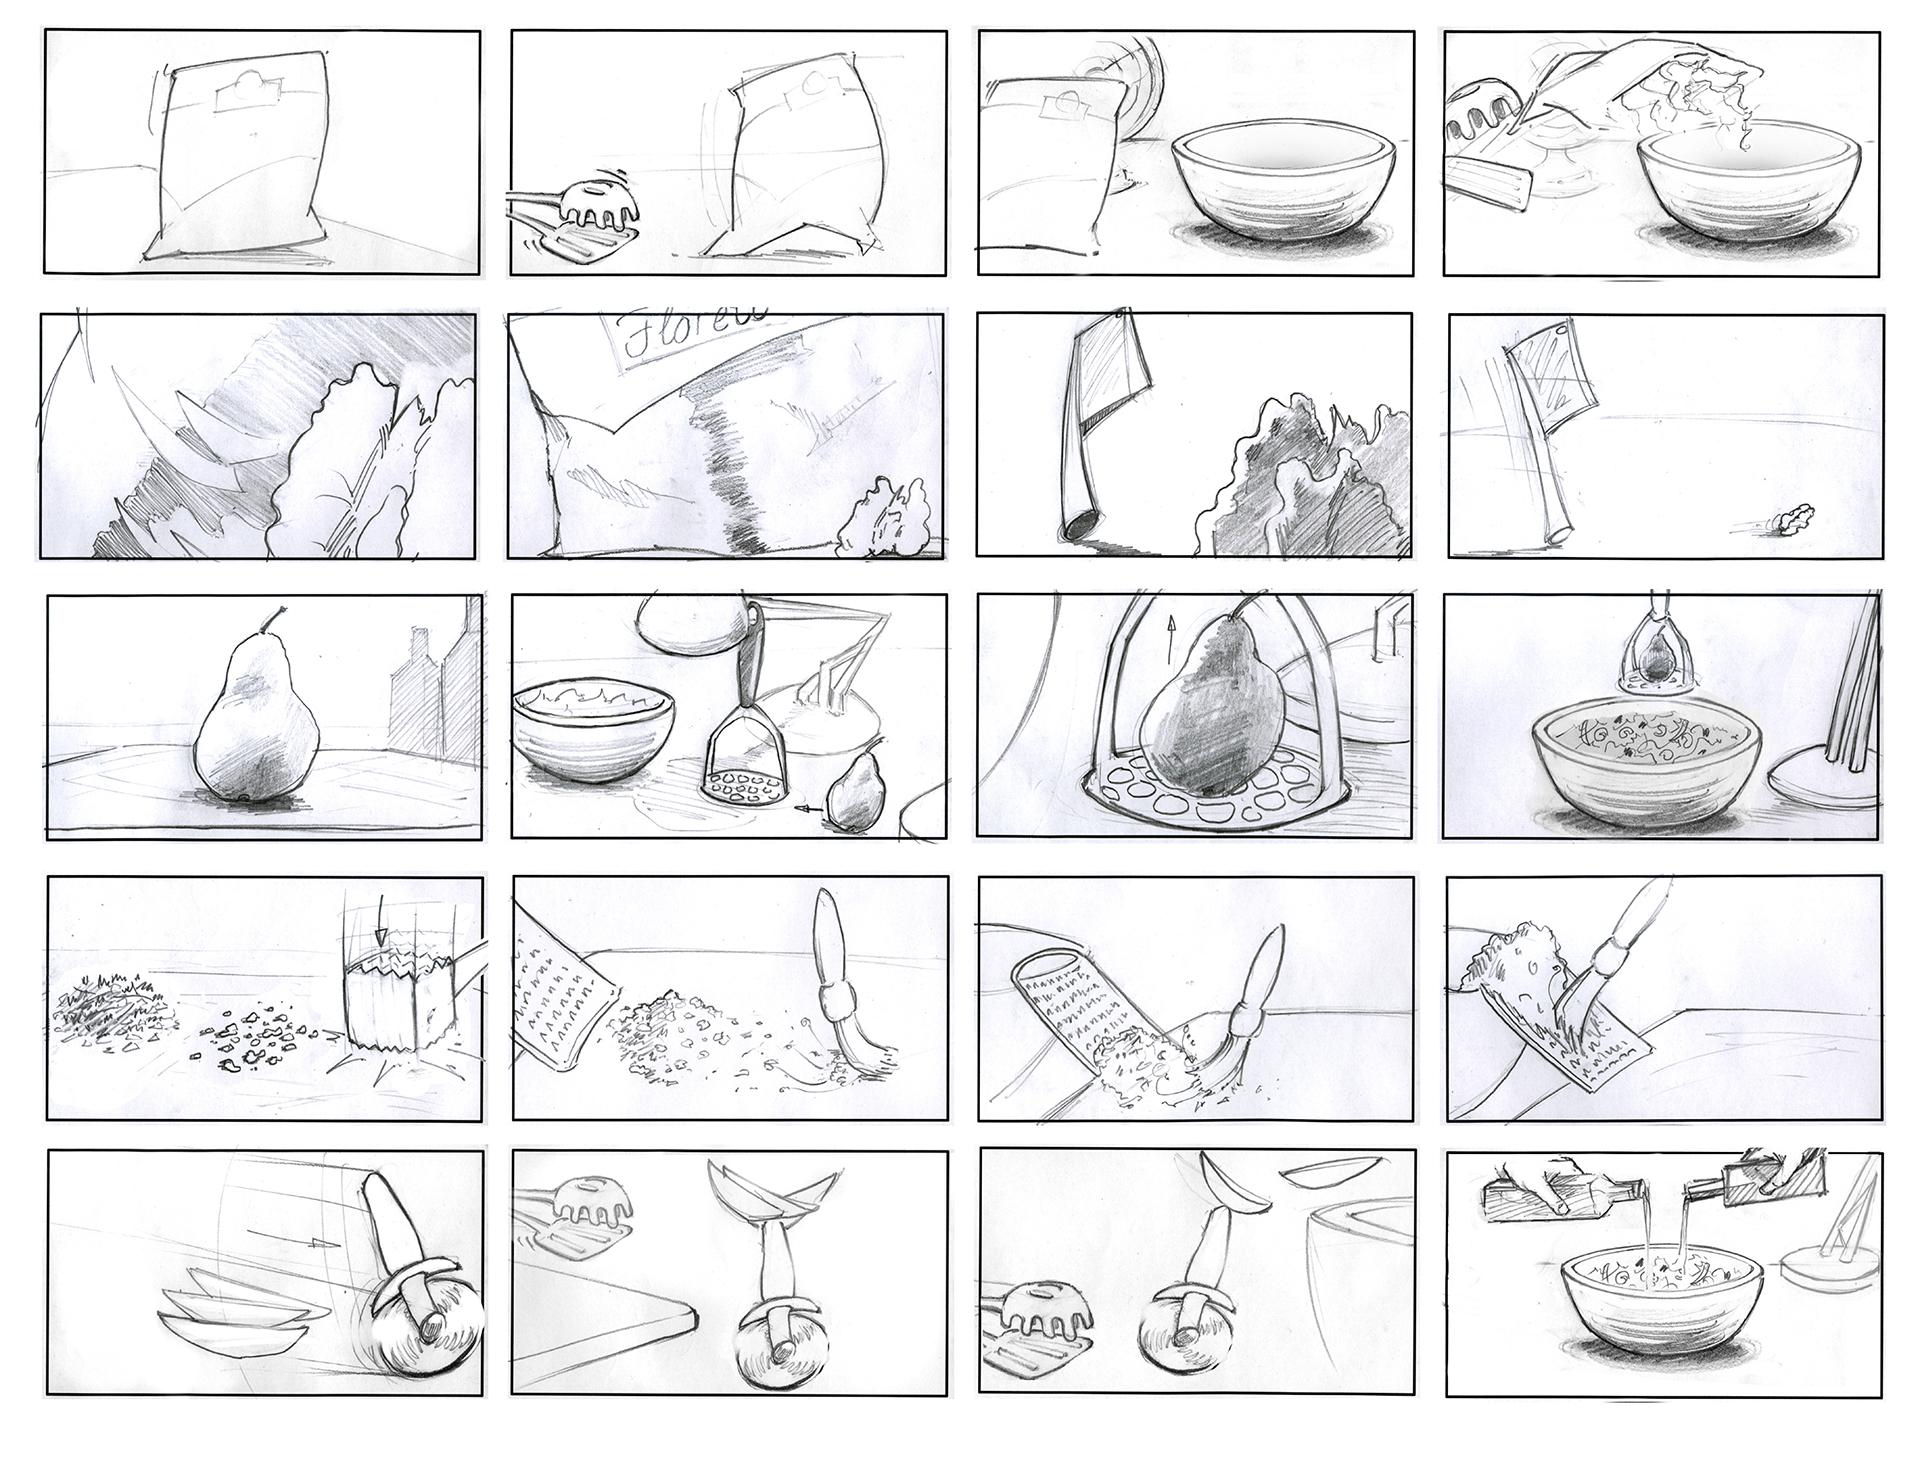 Jack Wright - Storyboard Artist - Storyboards